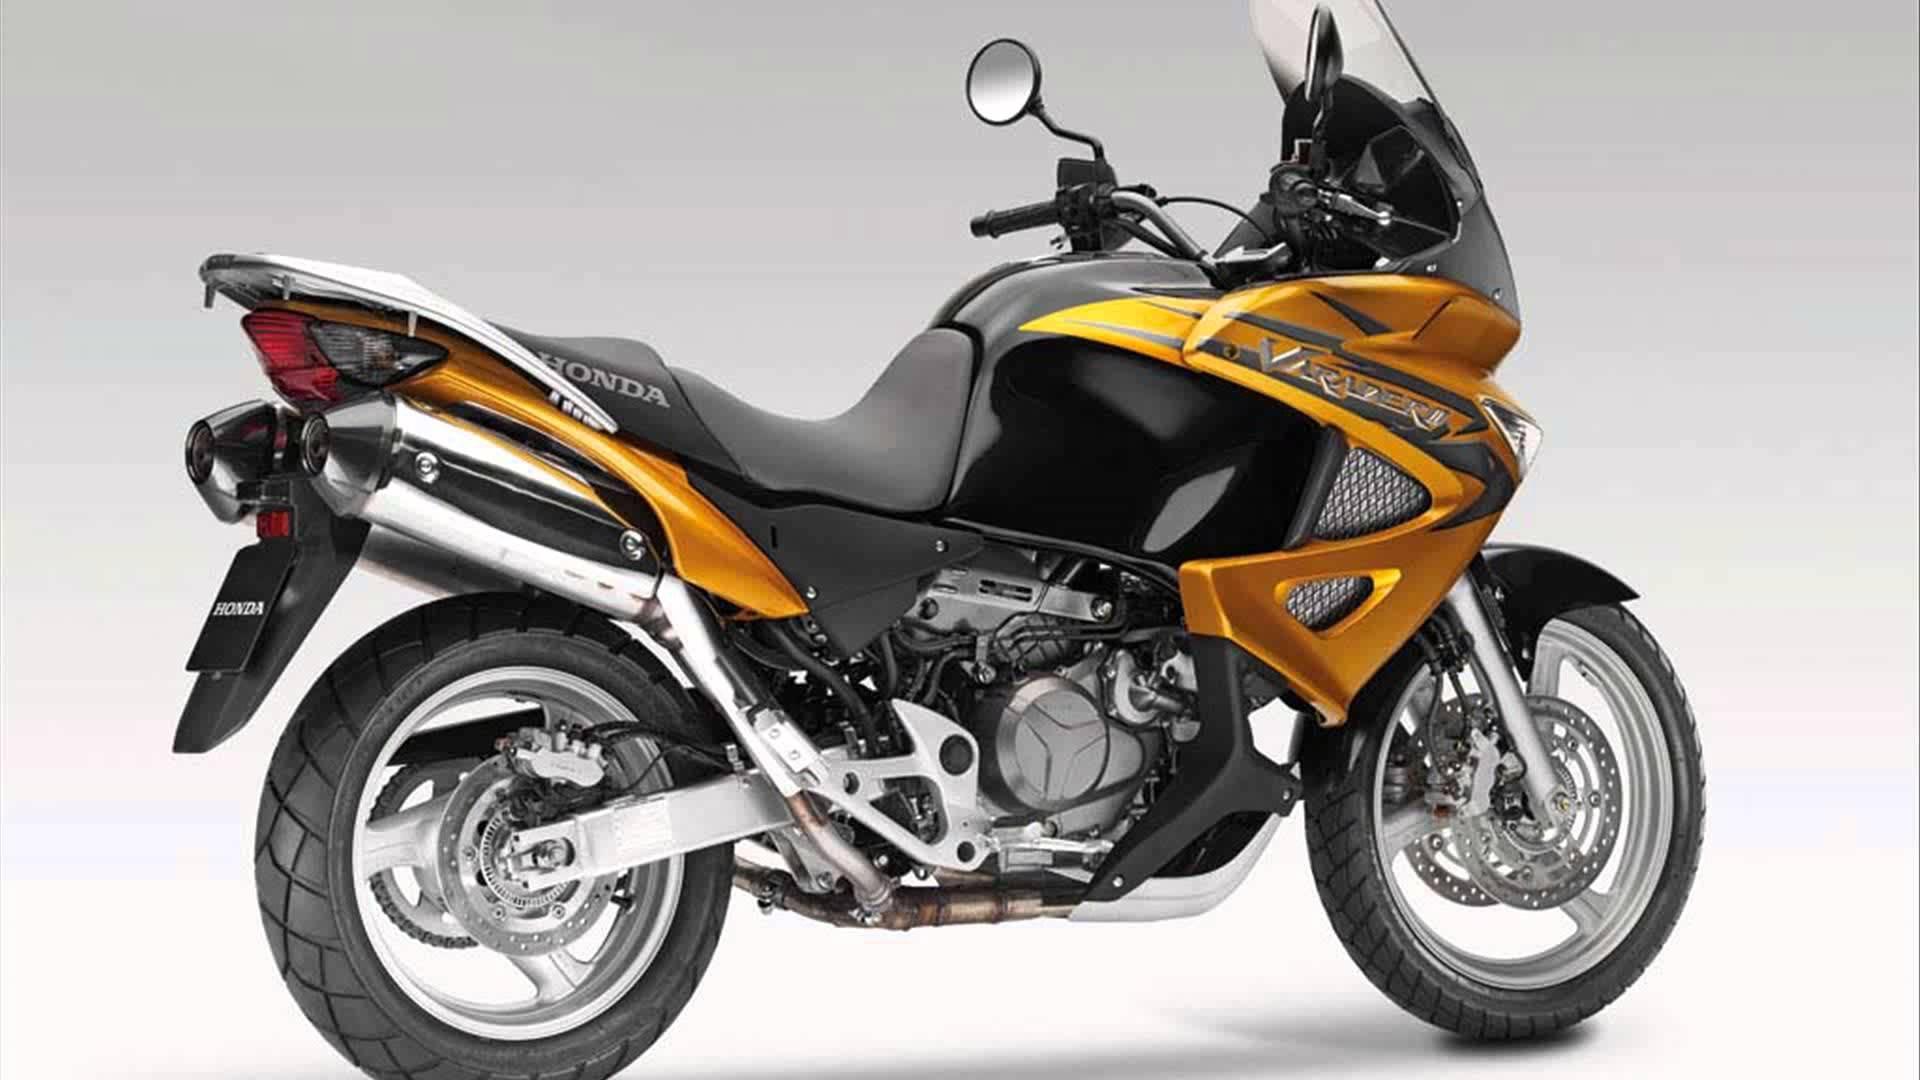 HONDA XL1000V バラデロのシート改造 - No-blog